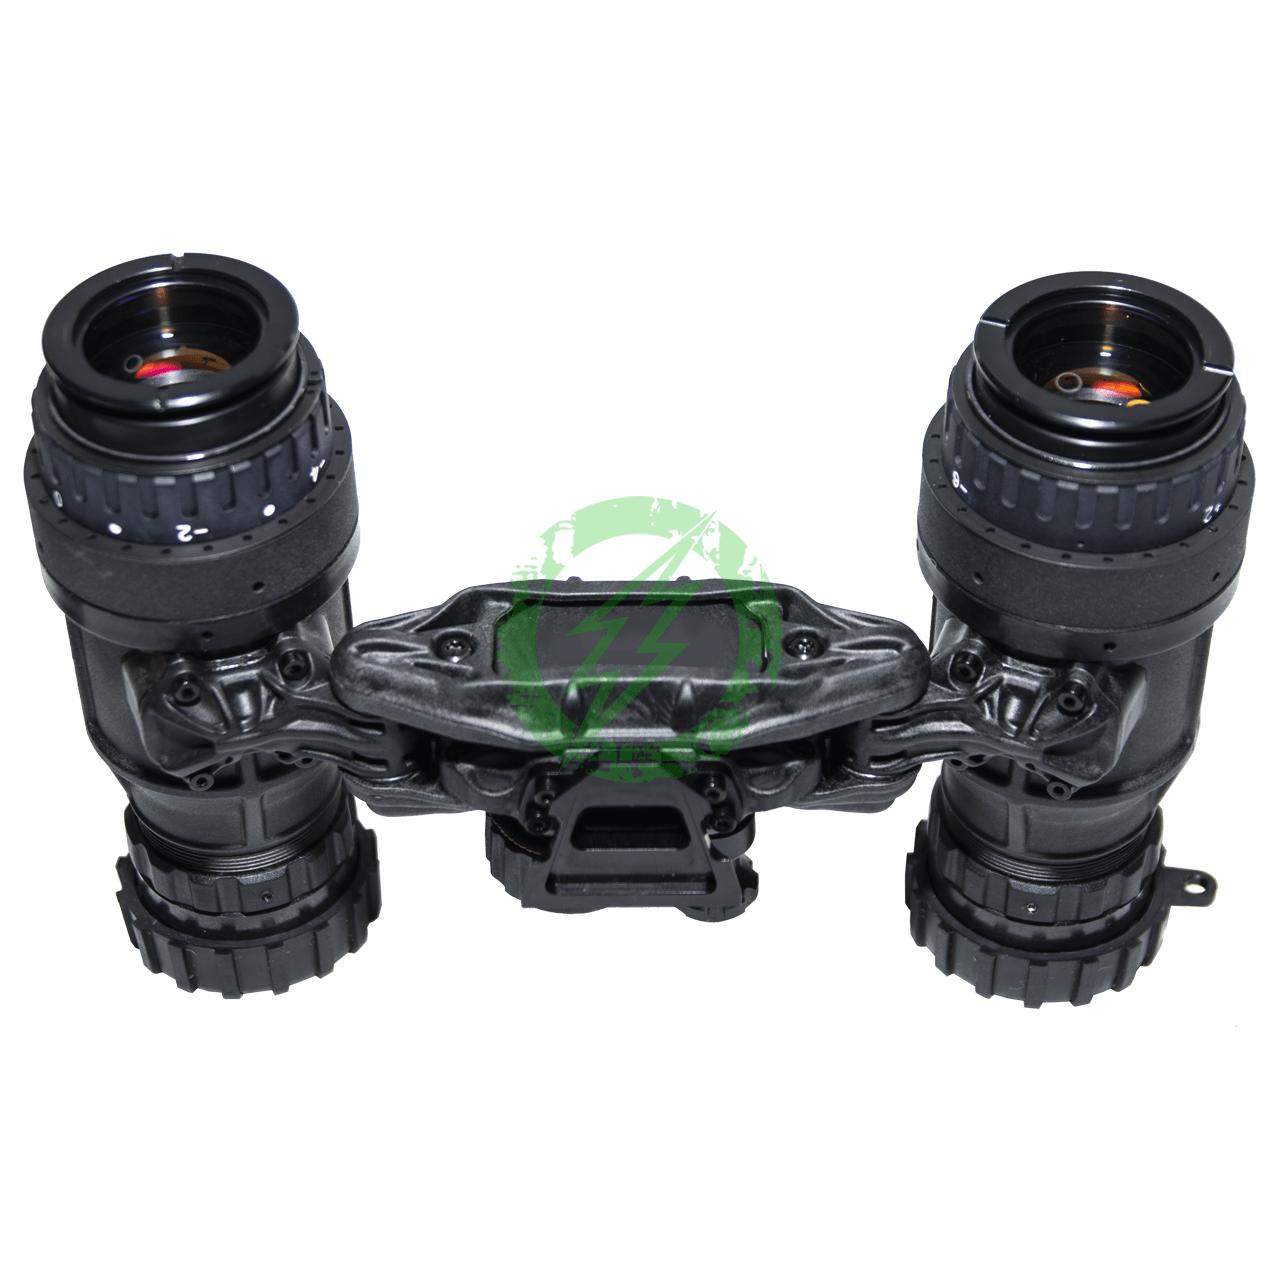 Milspec L3 Filmless White Phosphor DTNVS-14 Binocular Night Vision Device Top